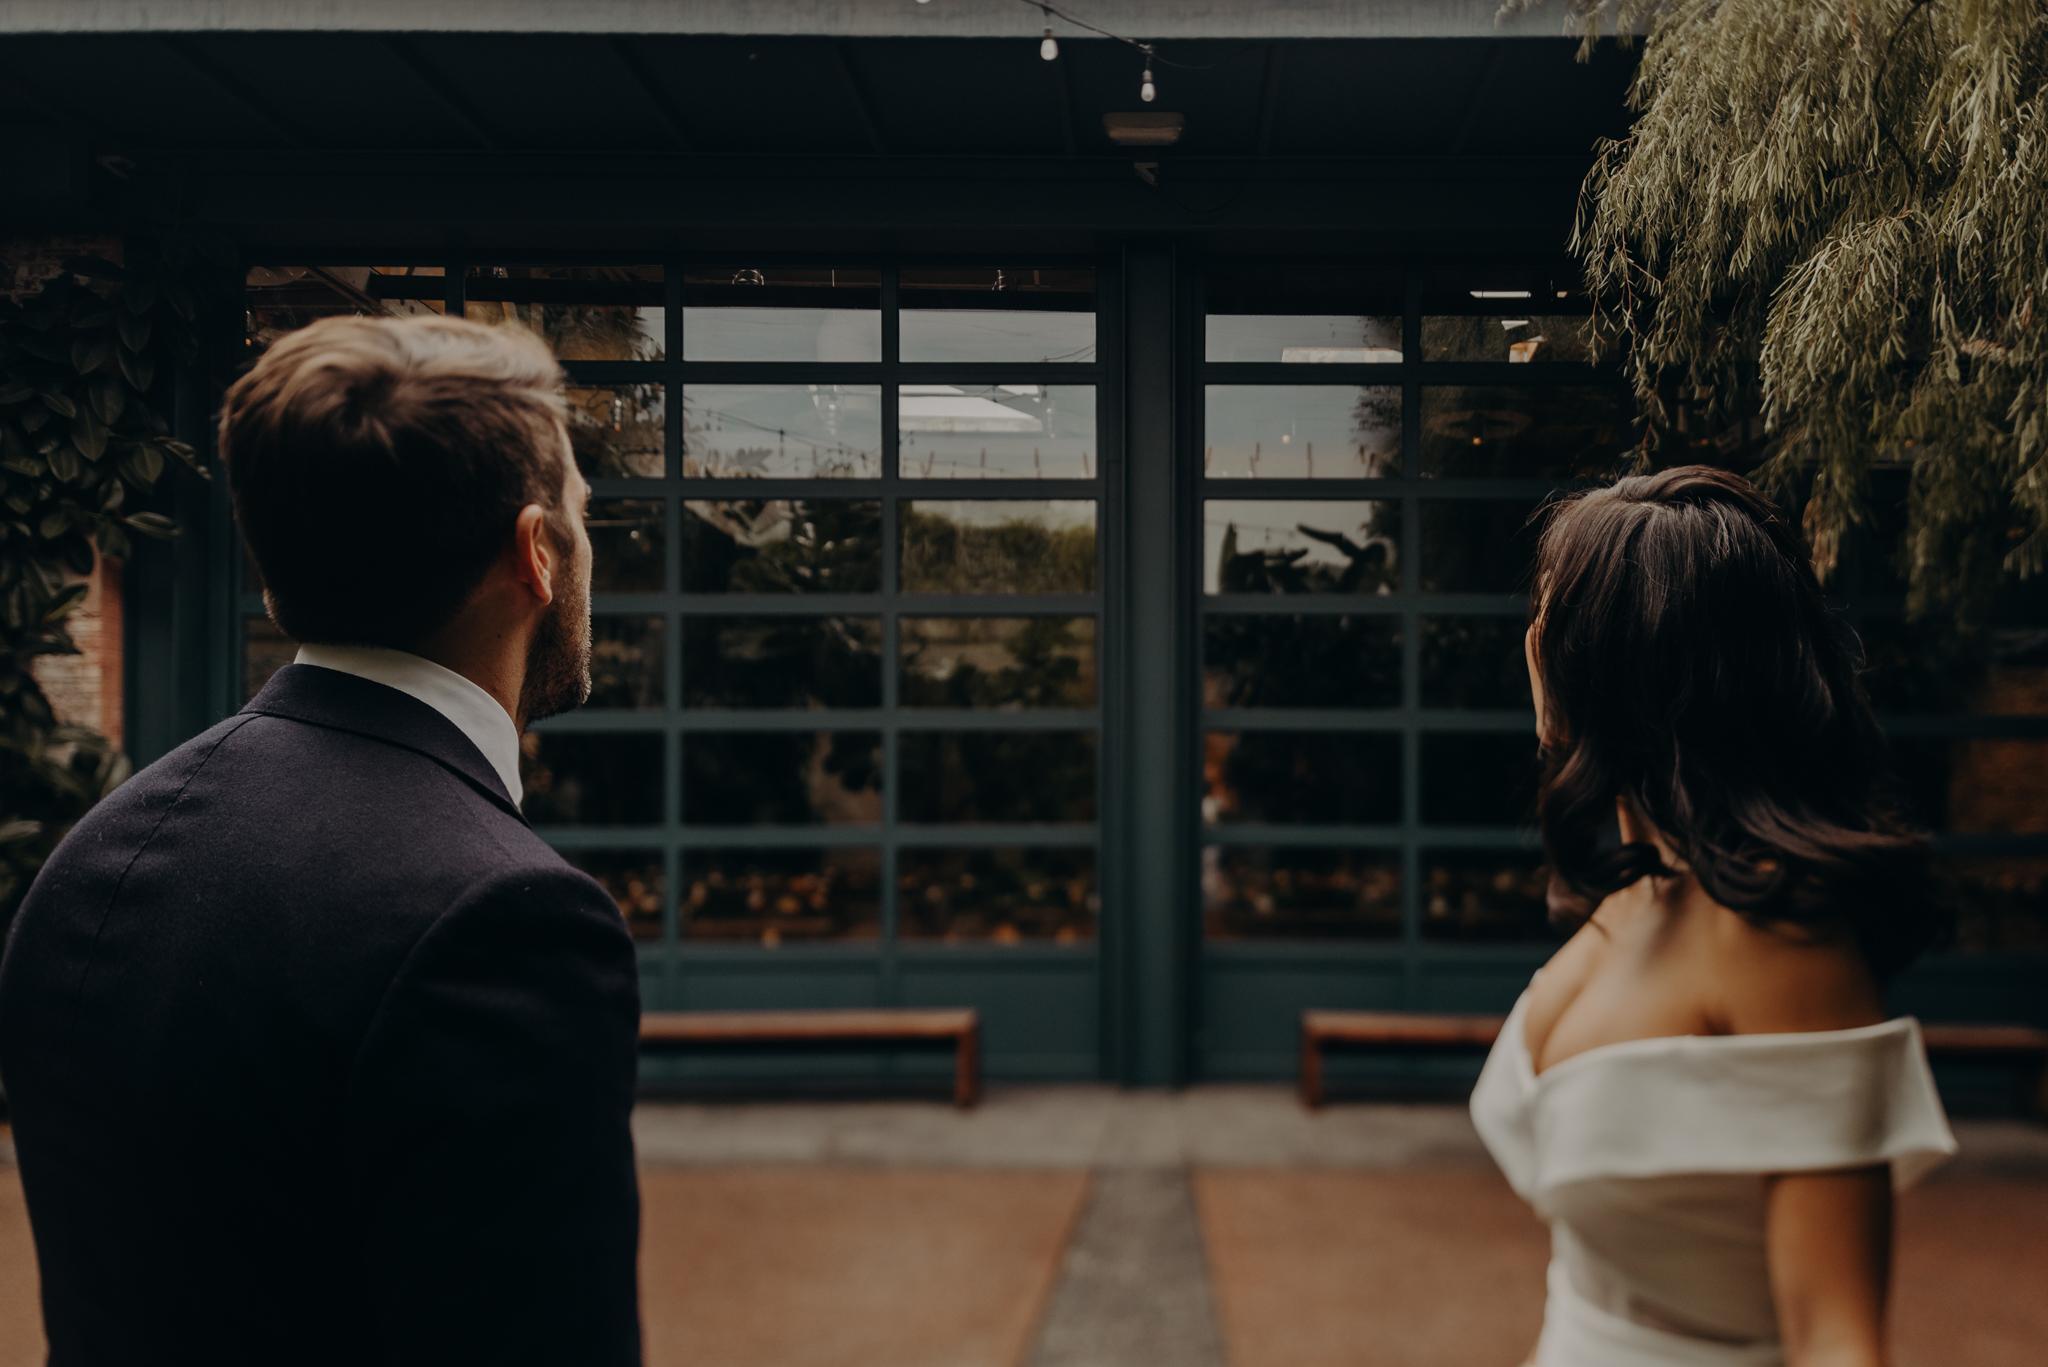 Wedding Photo LA - wedding photographer in los angeles - millwick wedding venue -isaiahandtaylor.com-048.jpg